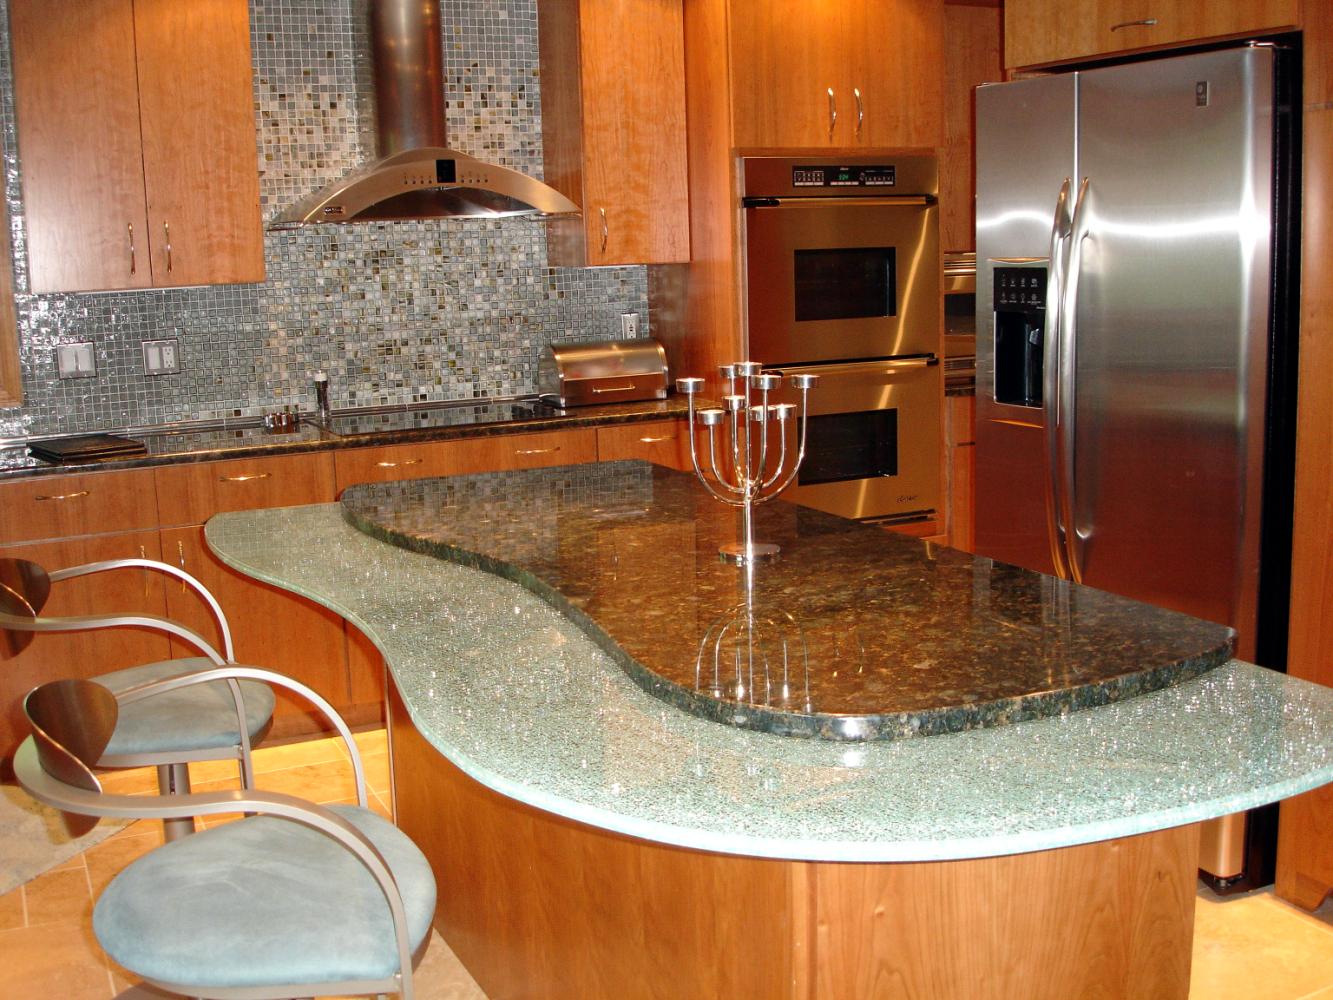 Home styles kitchen island Photo - 3